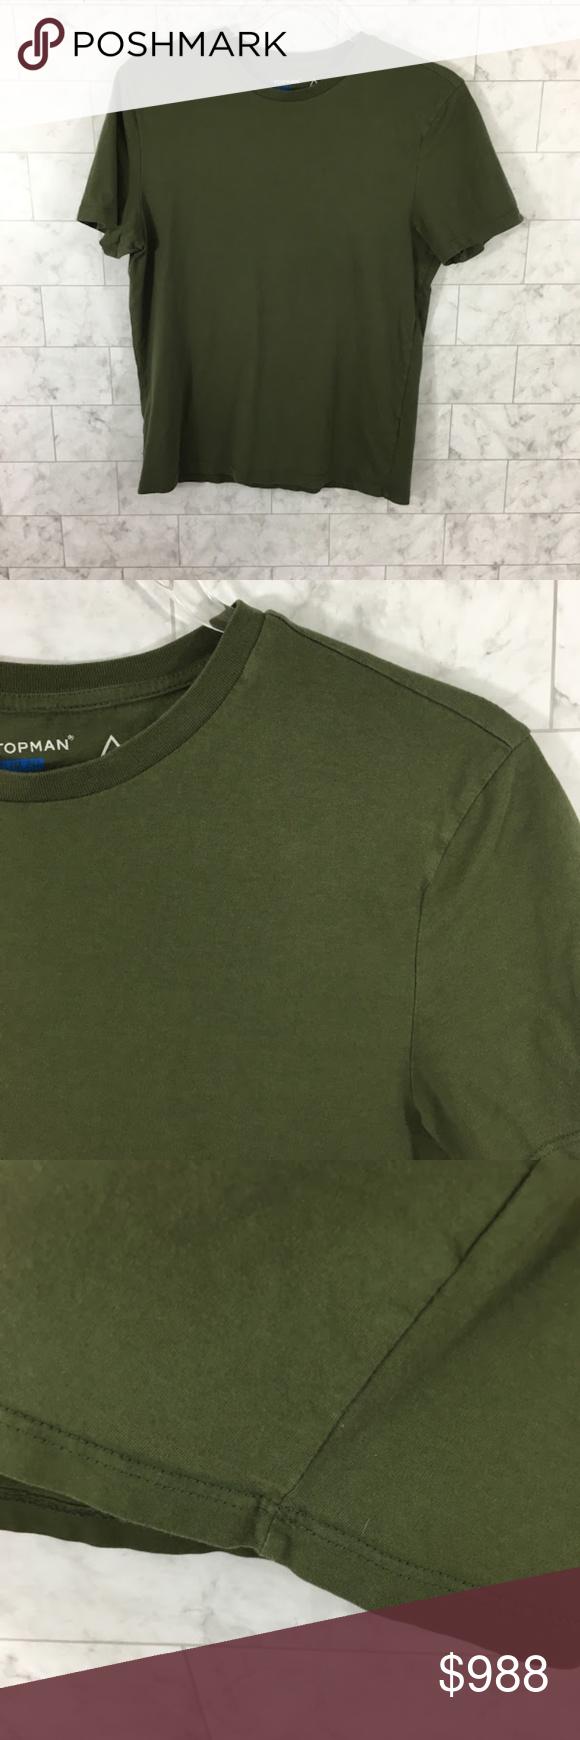 Topman Mens Olive Army Green Tshirt Bc19 Army Green Tshirt Long Sleeve Tshirt Men Topman